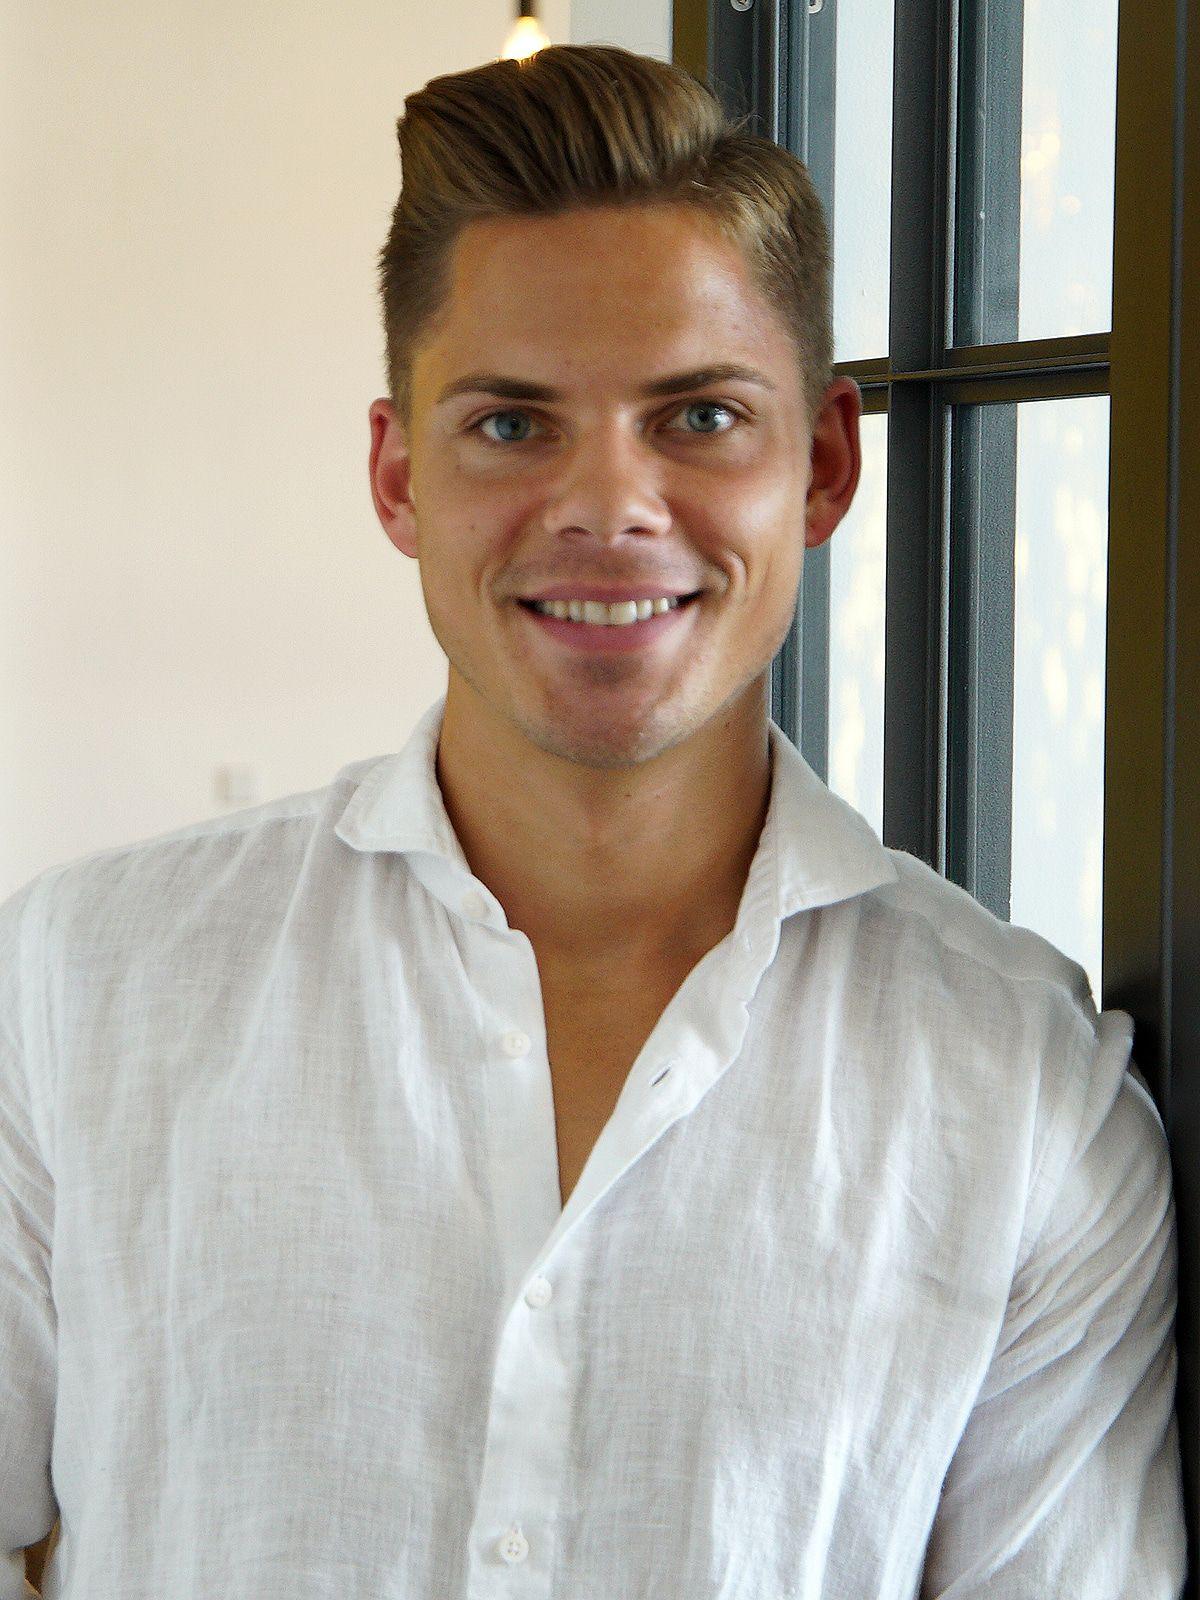 Cedric Beidinger: Job bei Claudia Obert als Fahrer und Lover!